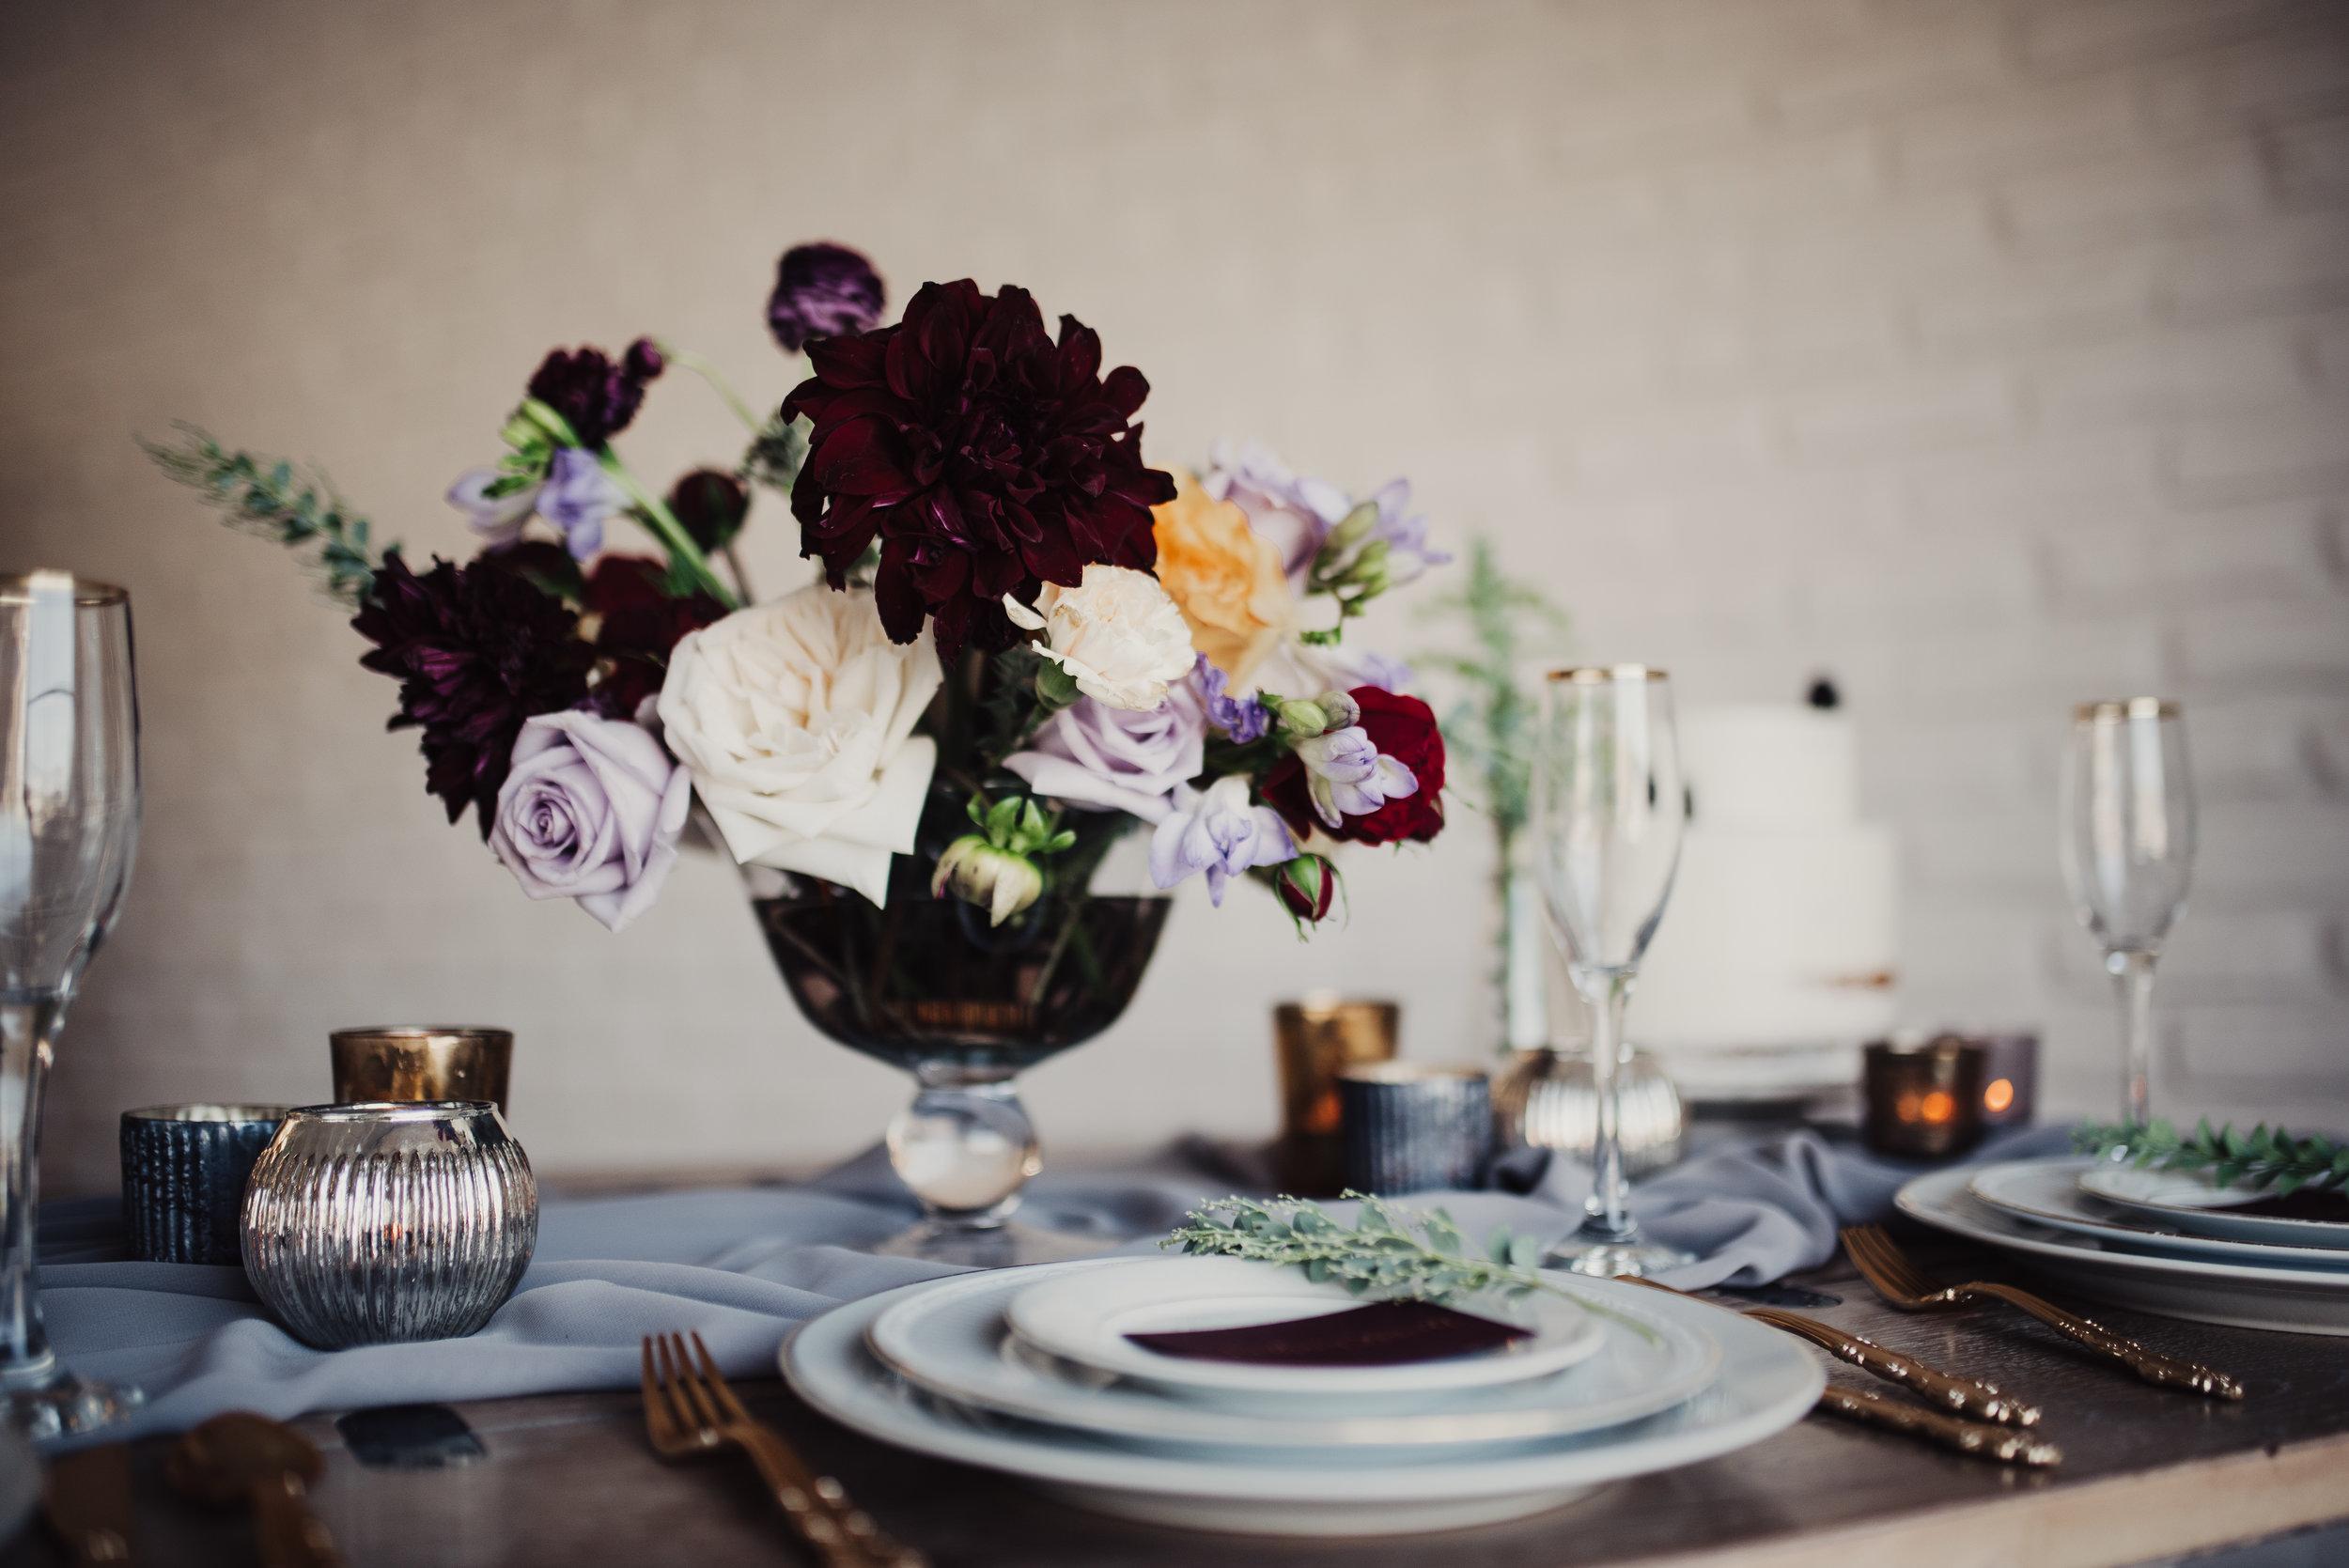 roots-floral-design-bright-cake-artistry.jpg